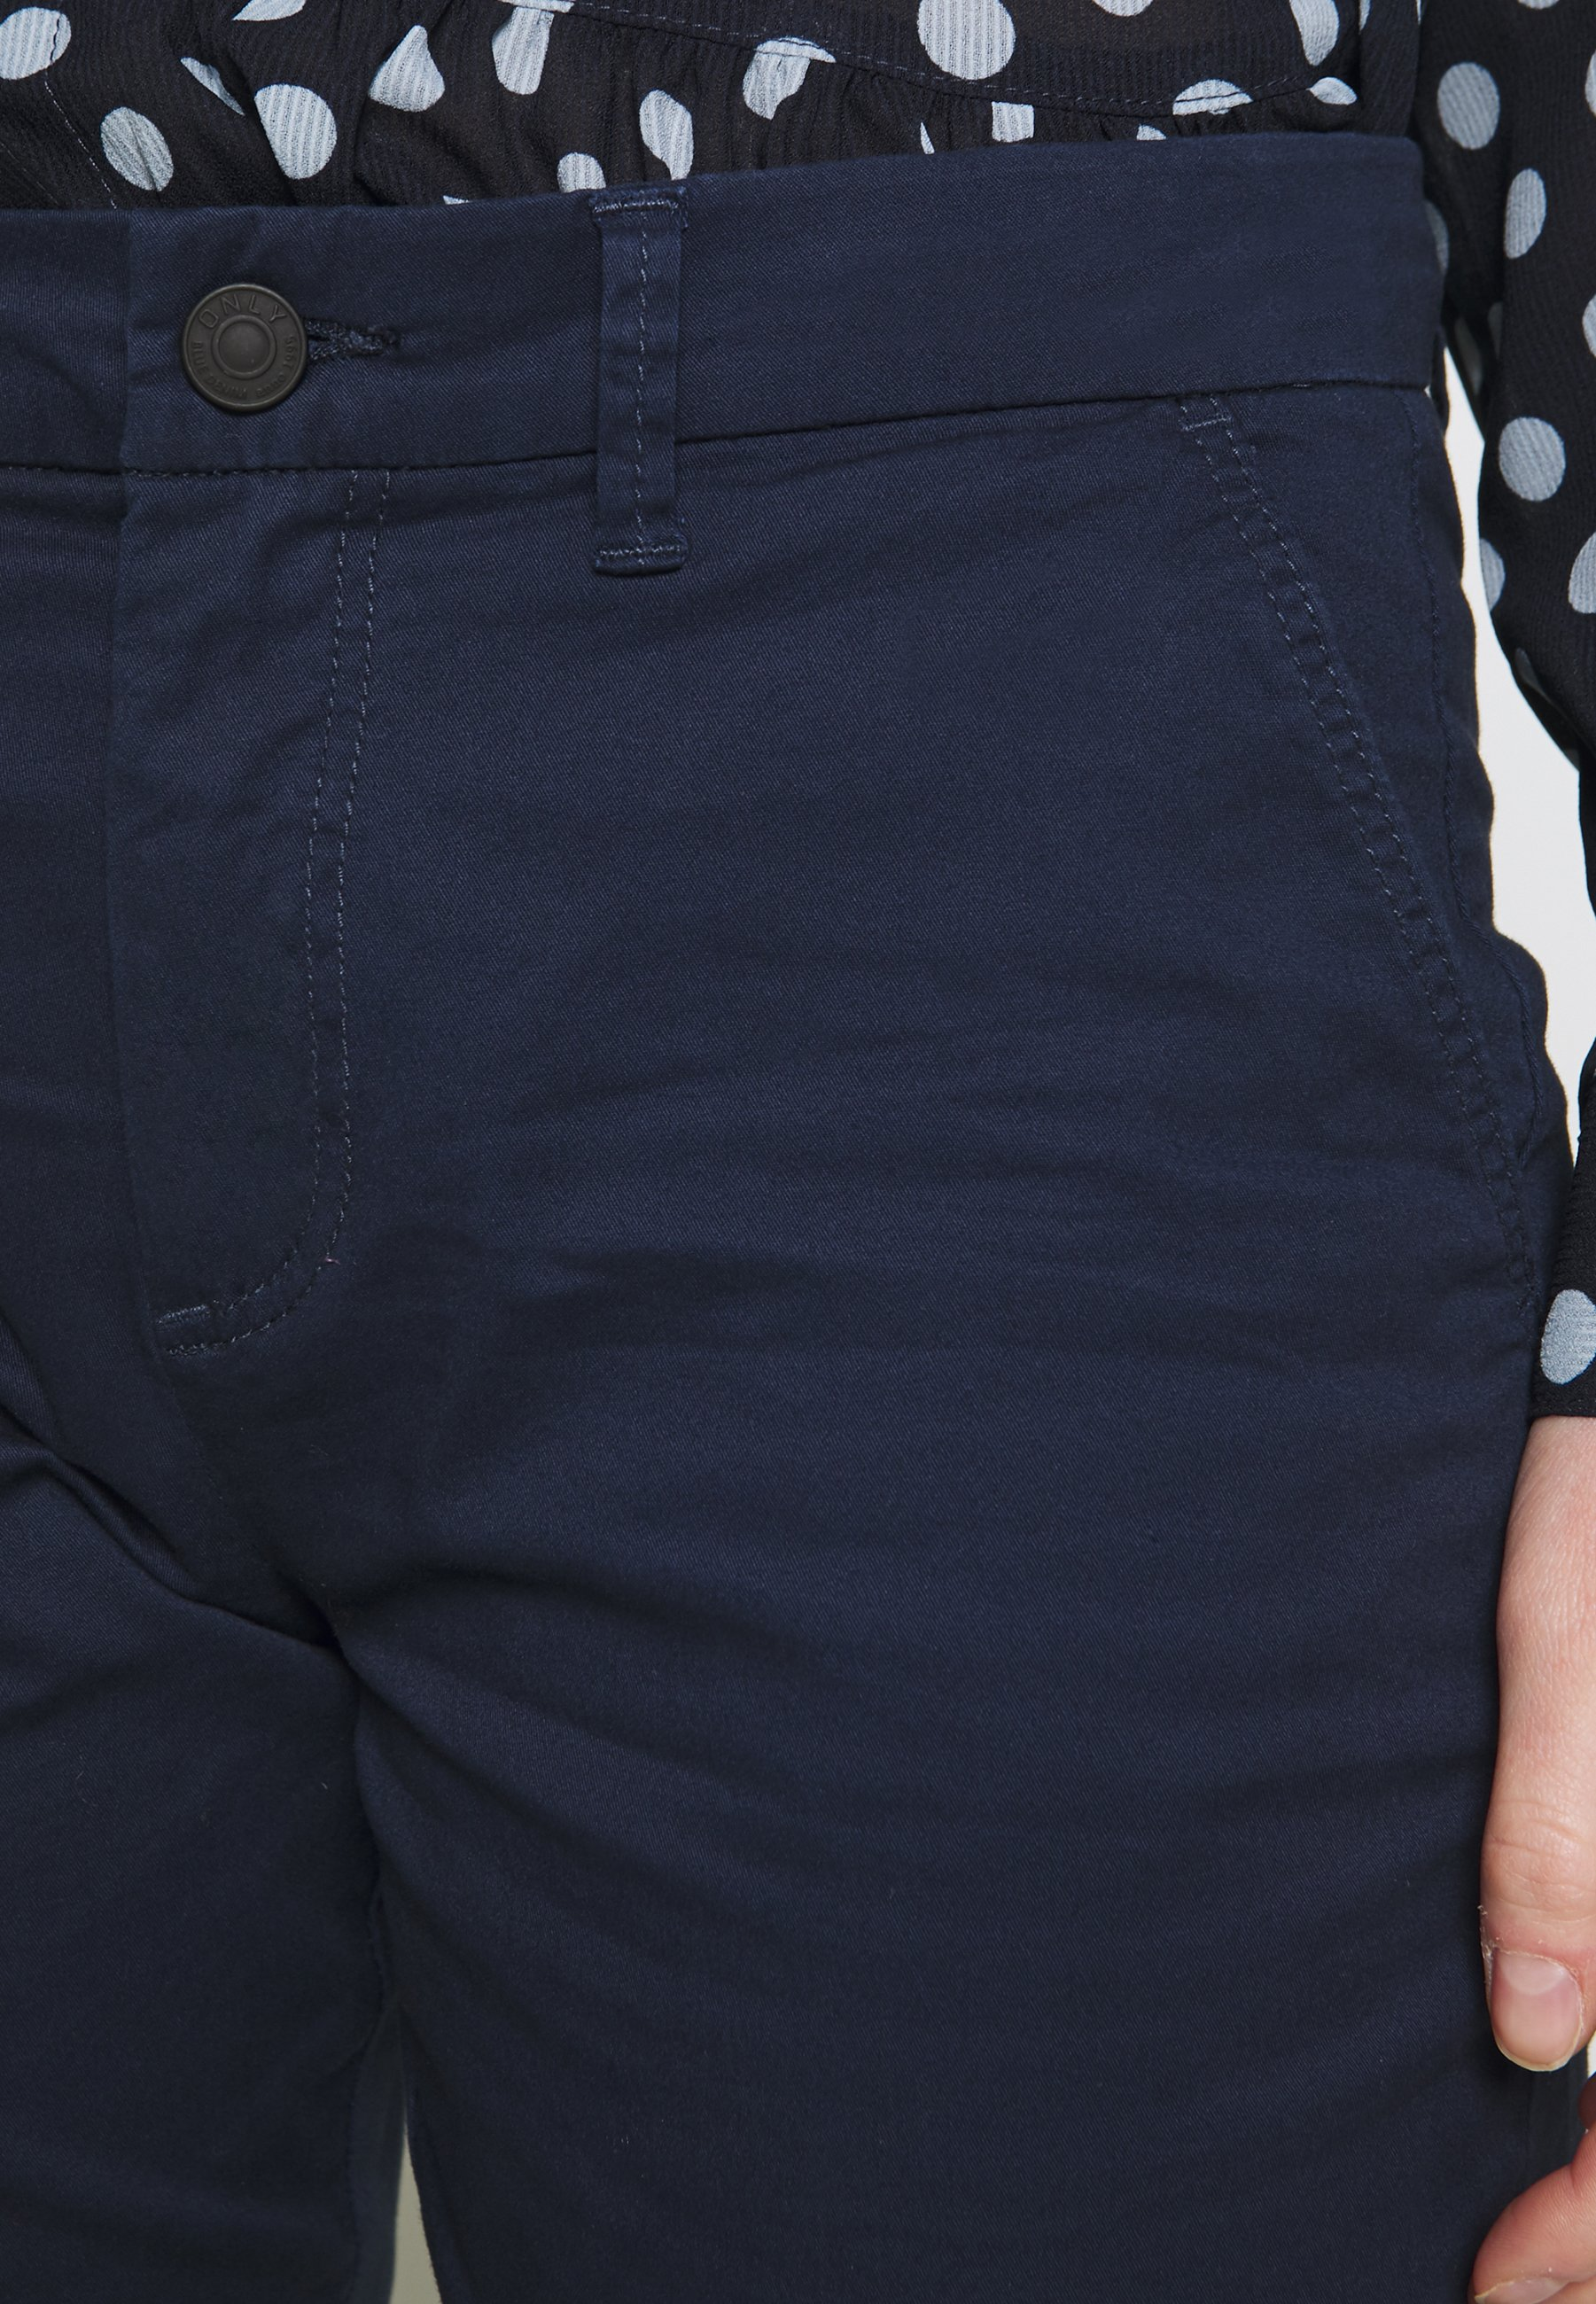 Only Onlparis Pants - Chino Navy Blazer